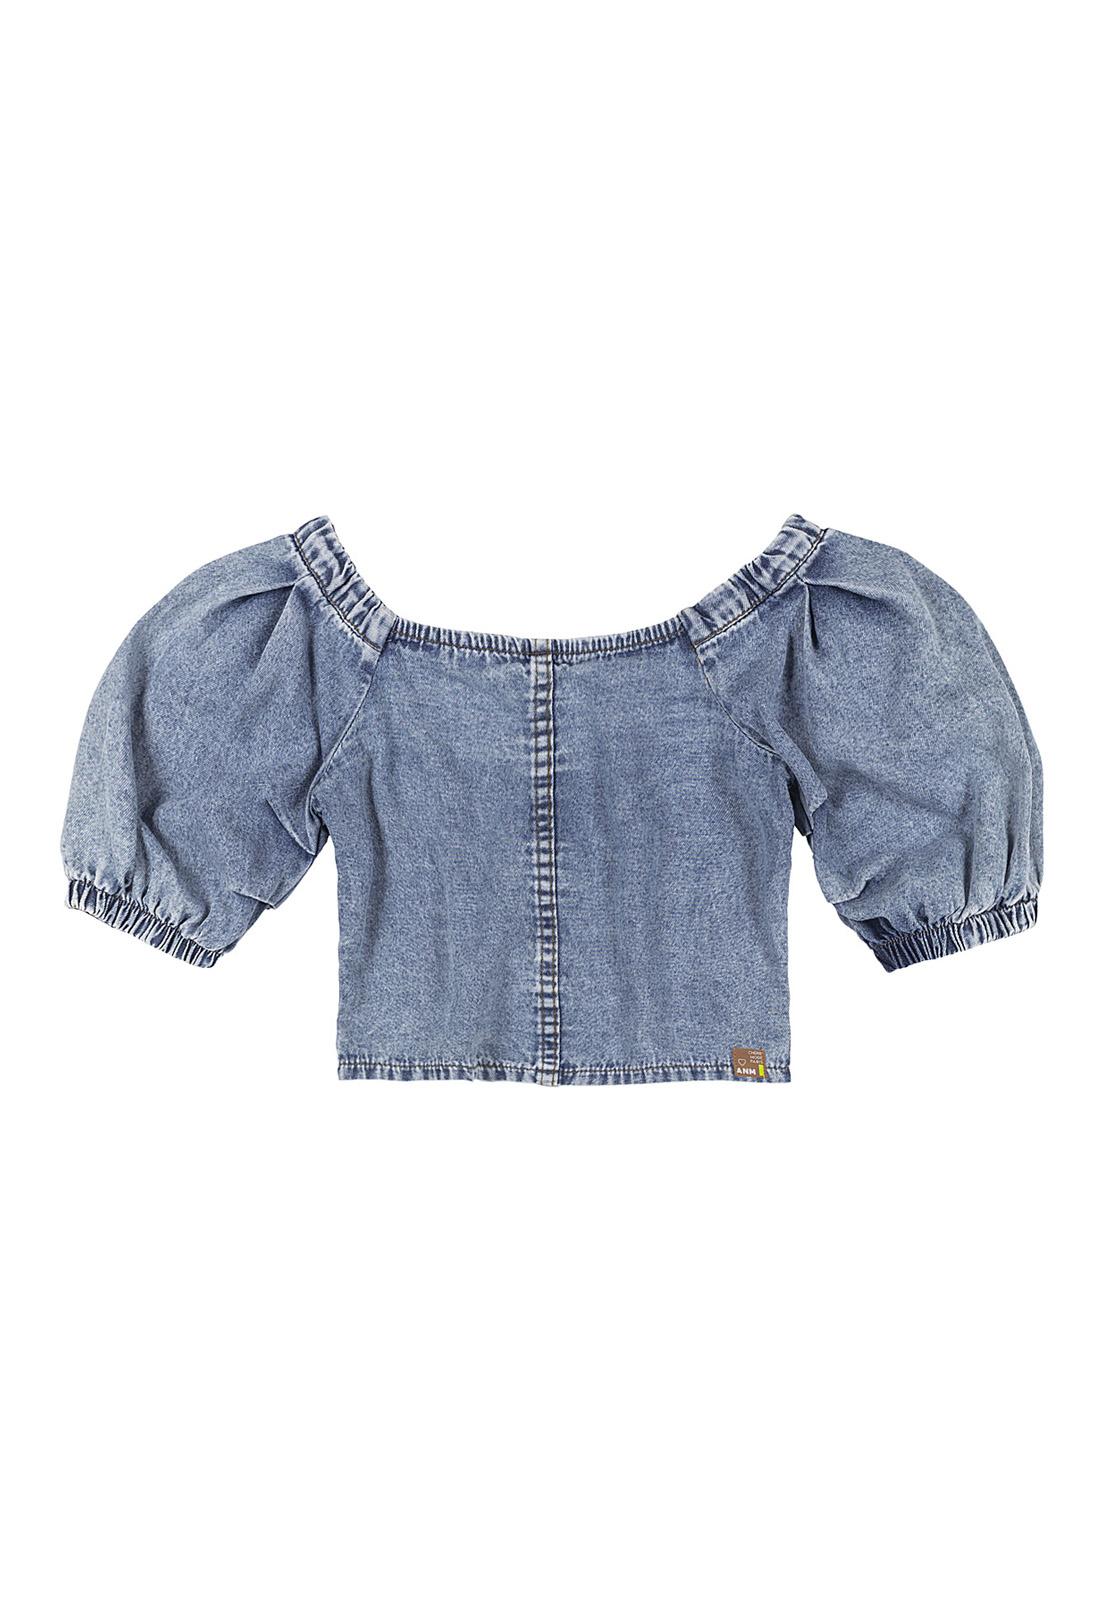 Blusa Infantil Jeans Ombro a Ombro Com Mangas Bufantes Animê